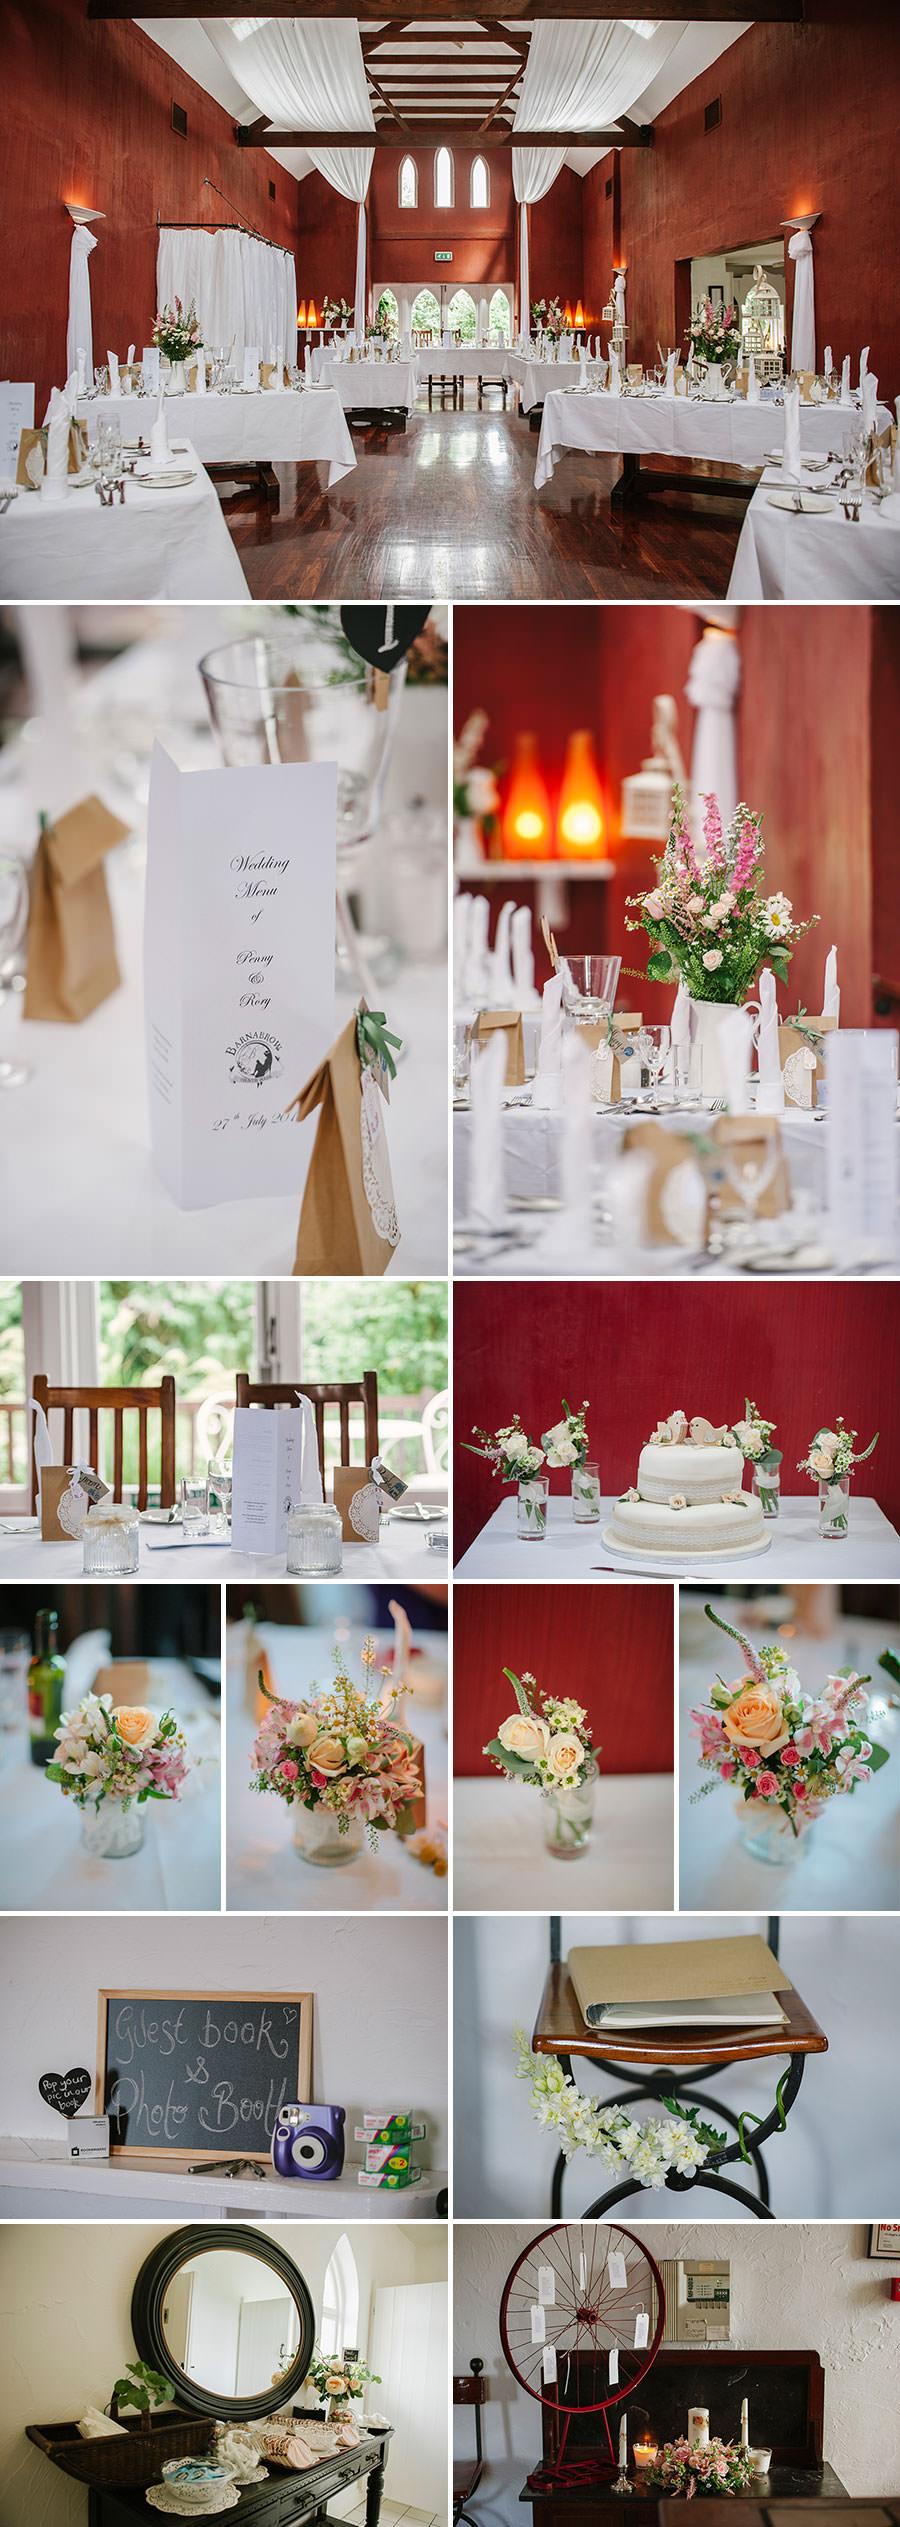 P + R | Barnabrow Country House Wedding | Irish - Australian Wedding | Cork Wedding Photography 52